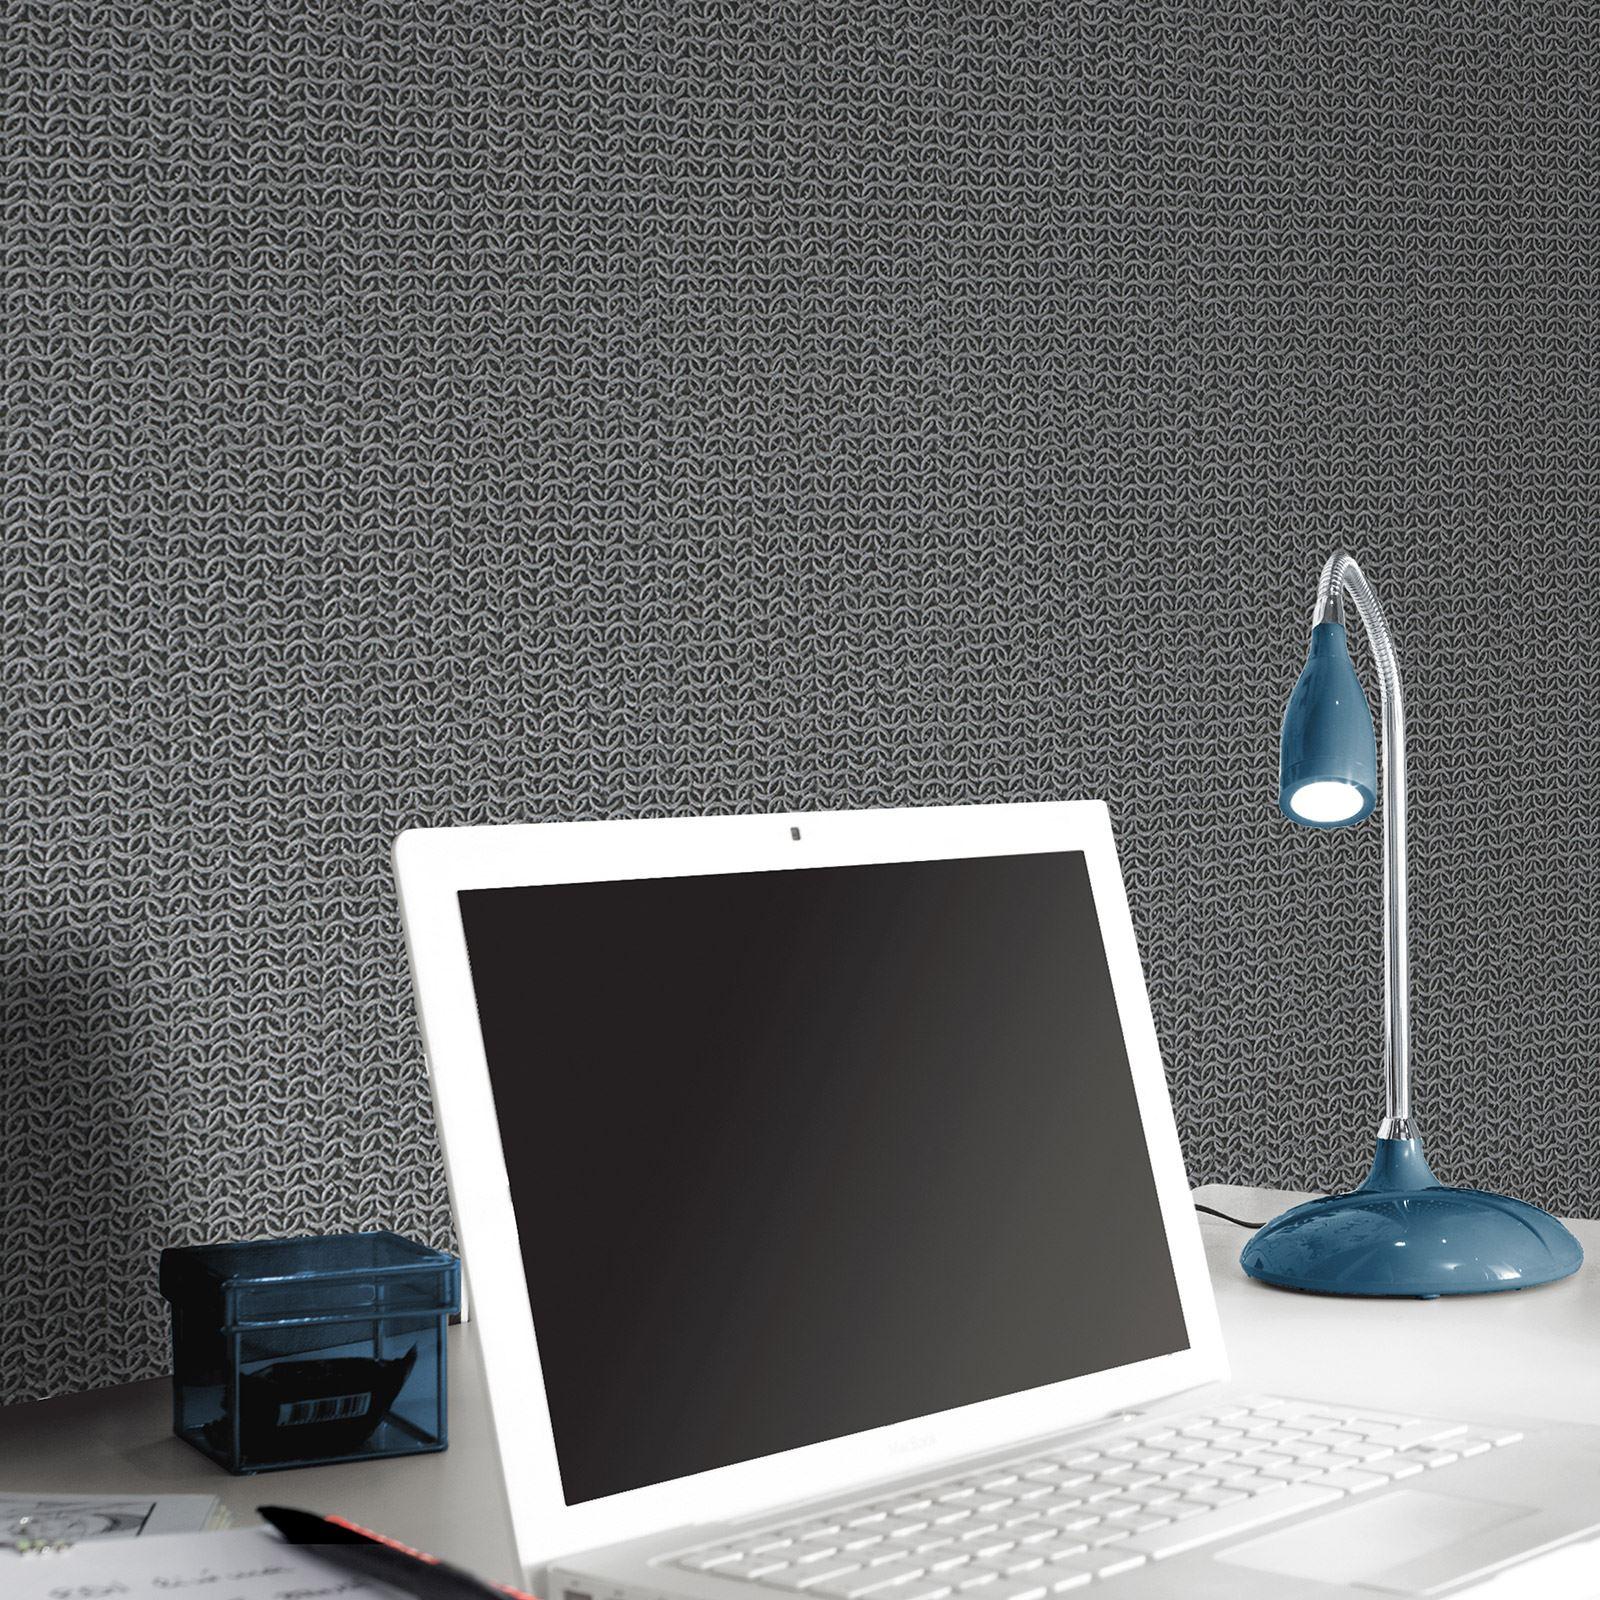 grau tapete gemustert sterne blumenmuster federn b ume. Black Bedroom Furniture Sets. Home Design Ideas